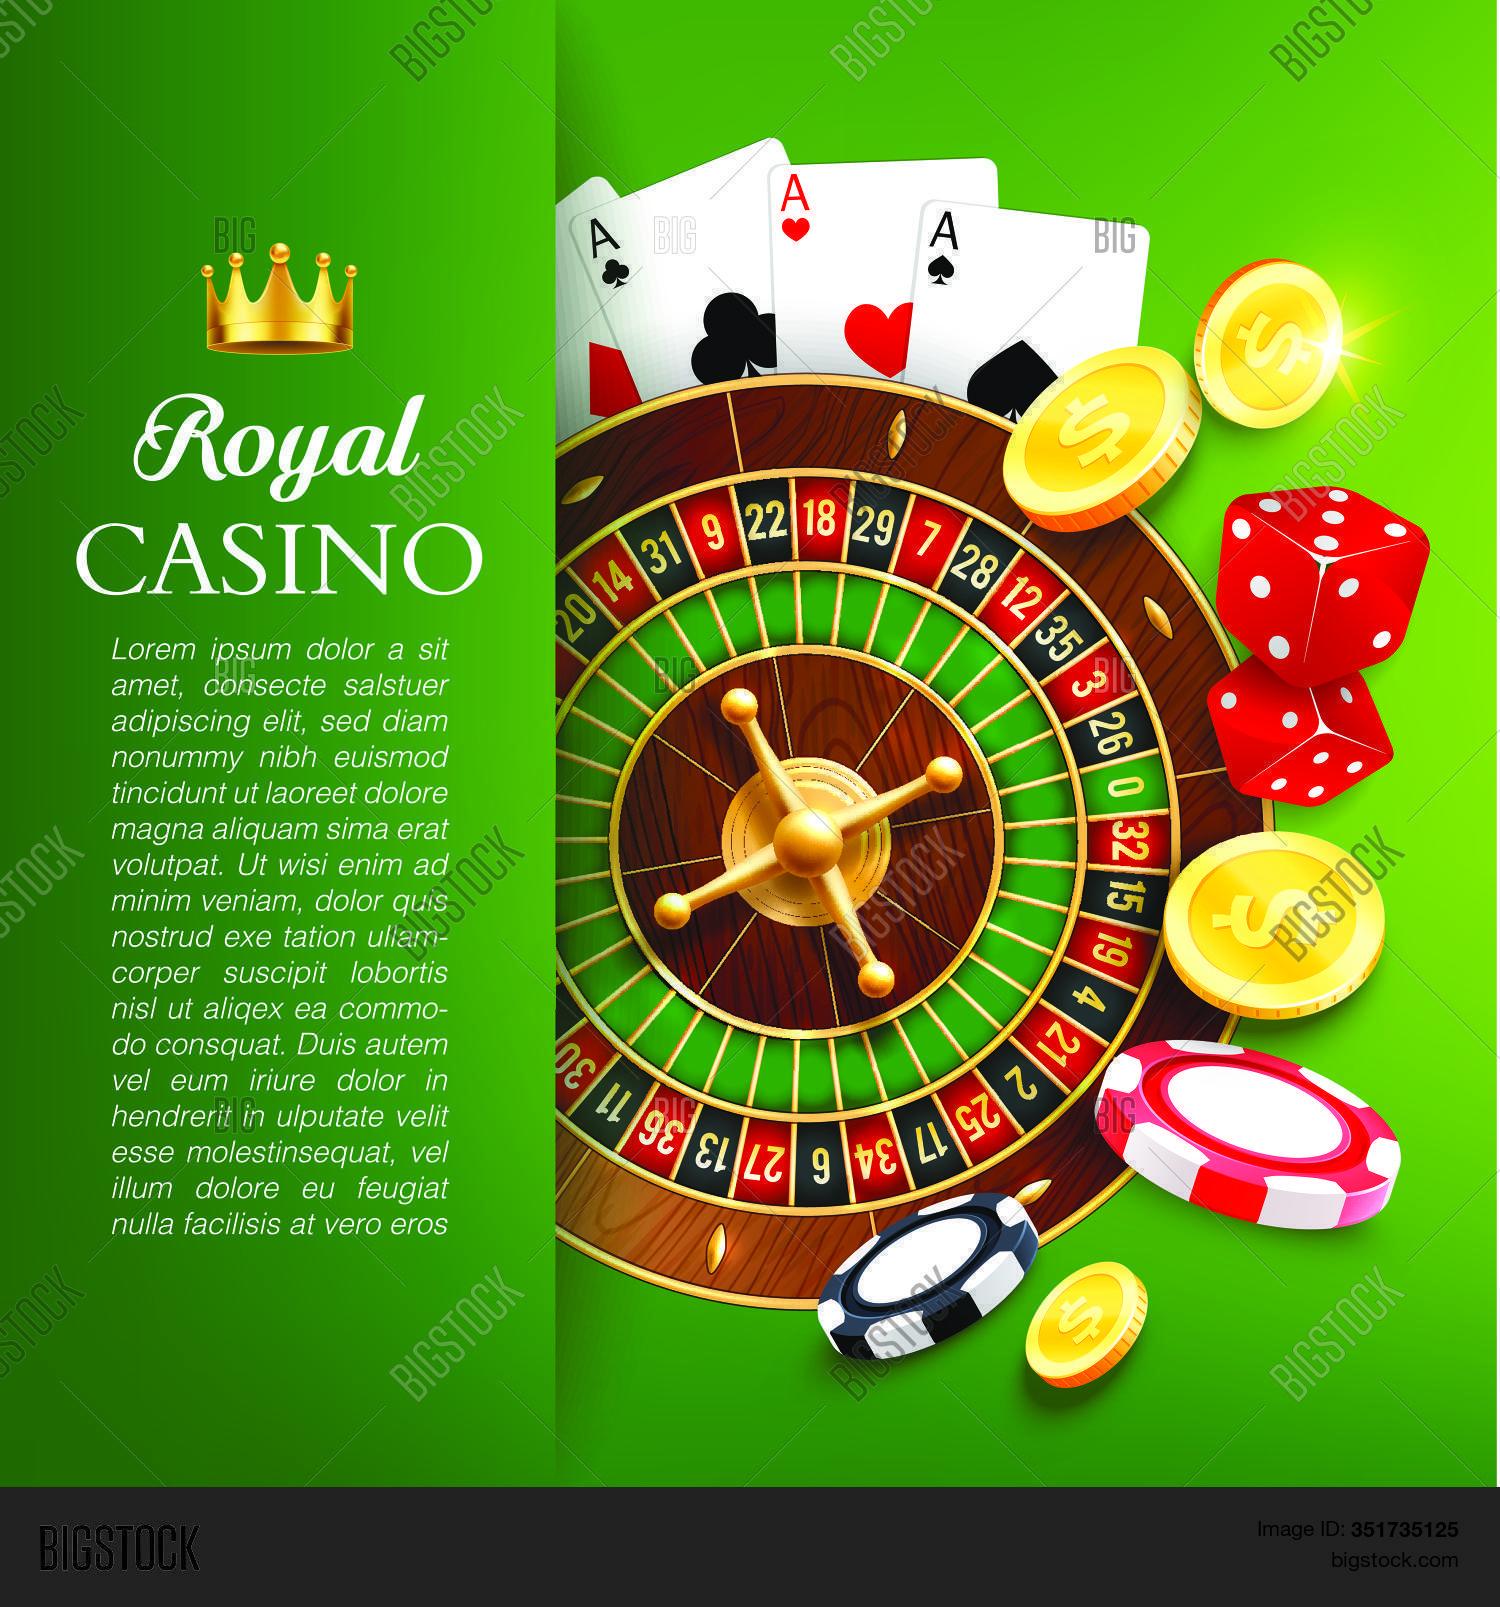 crown casino online poker